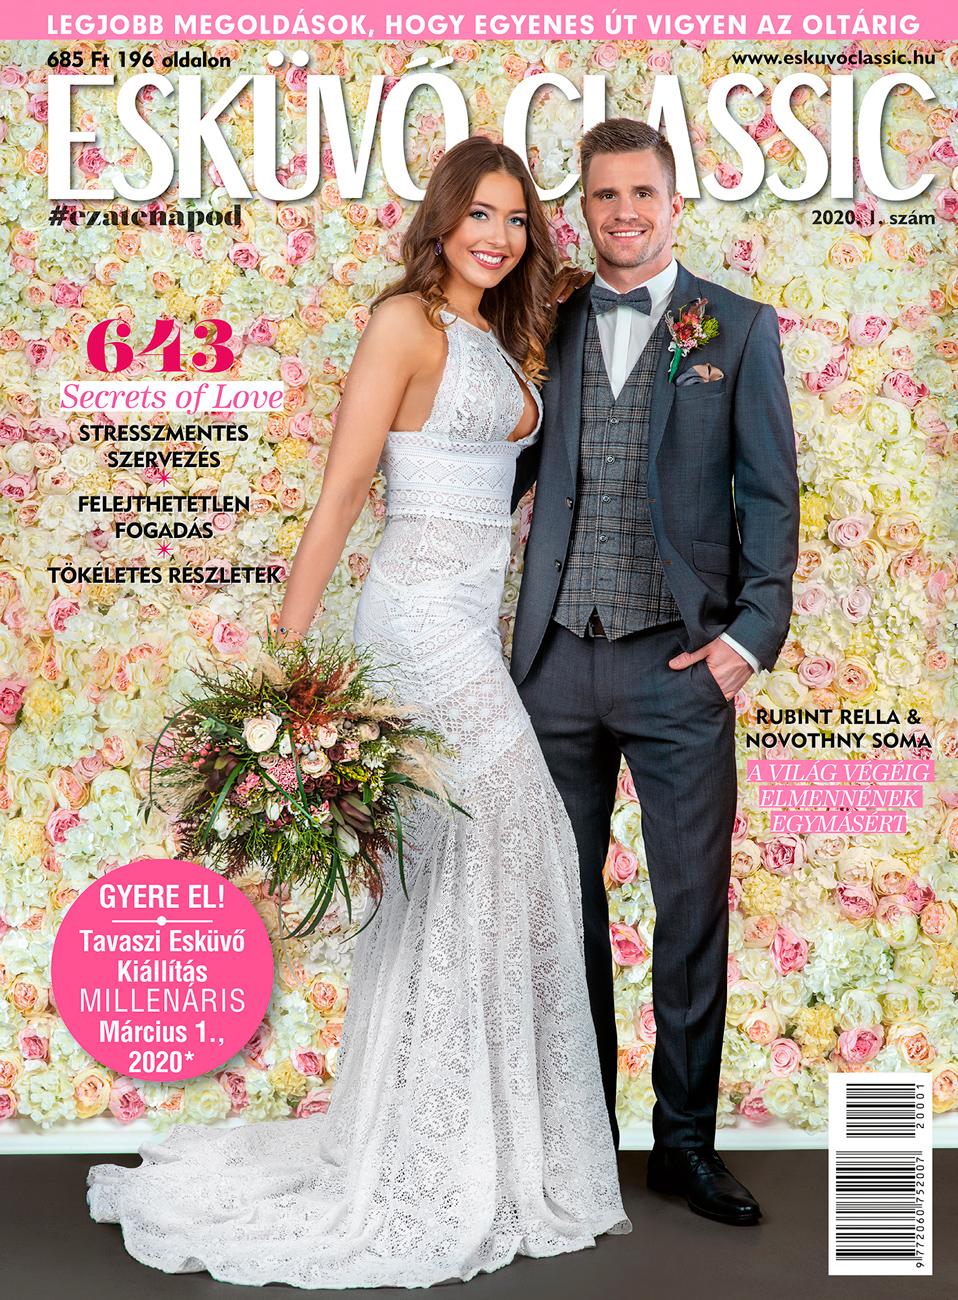 Esküvő Classic magazin - esküvői magazin, esküvő magazin